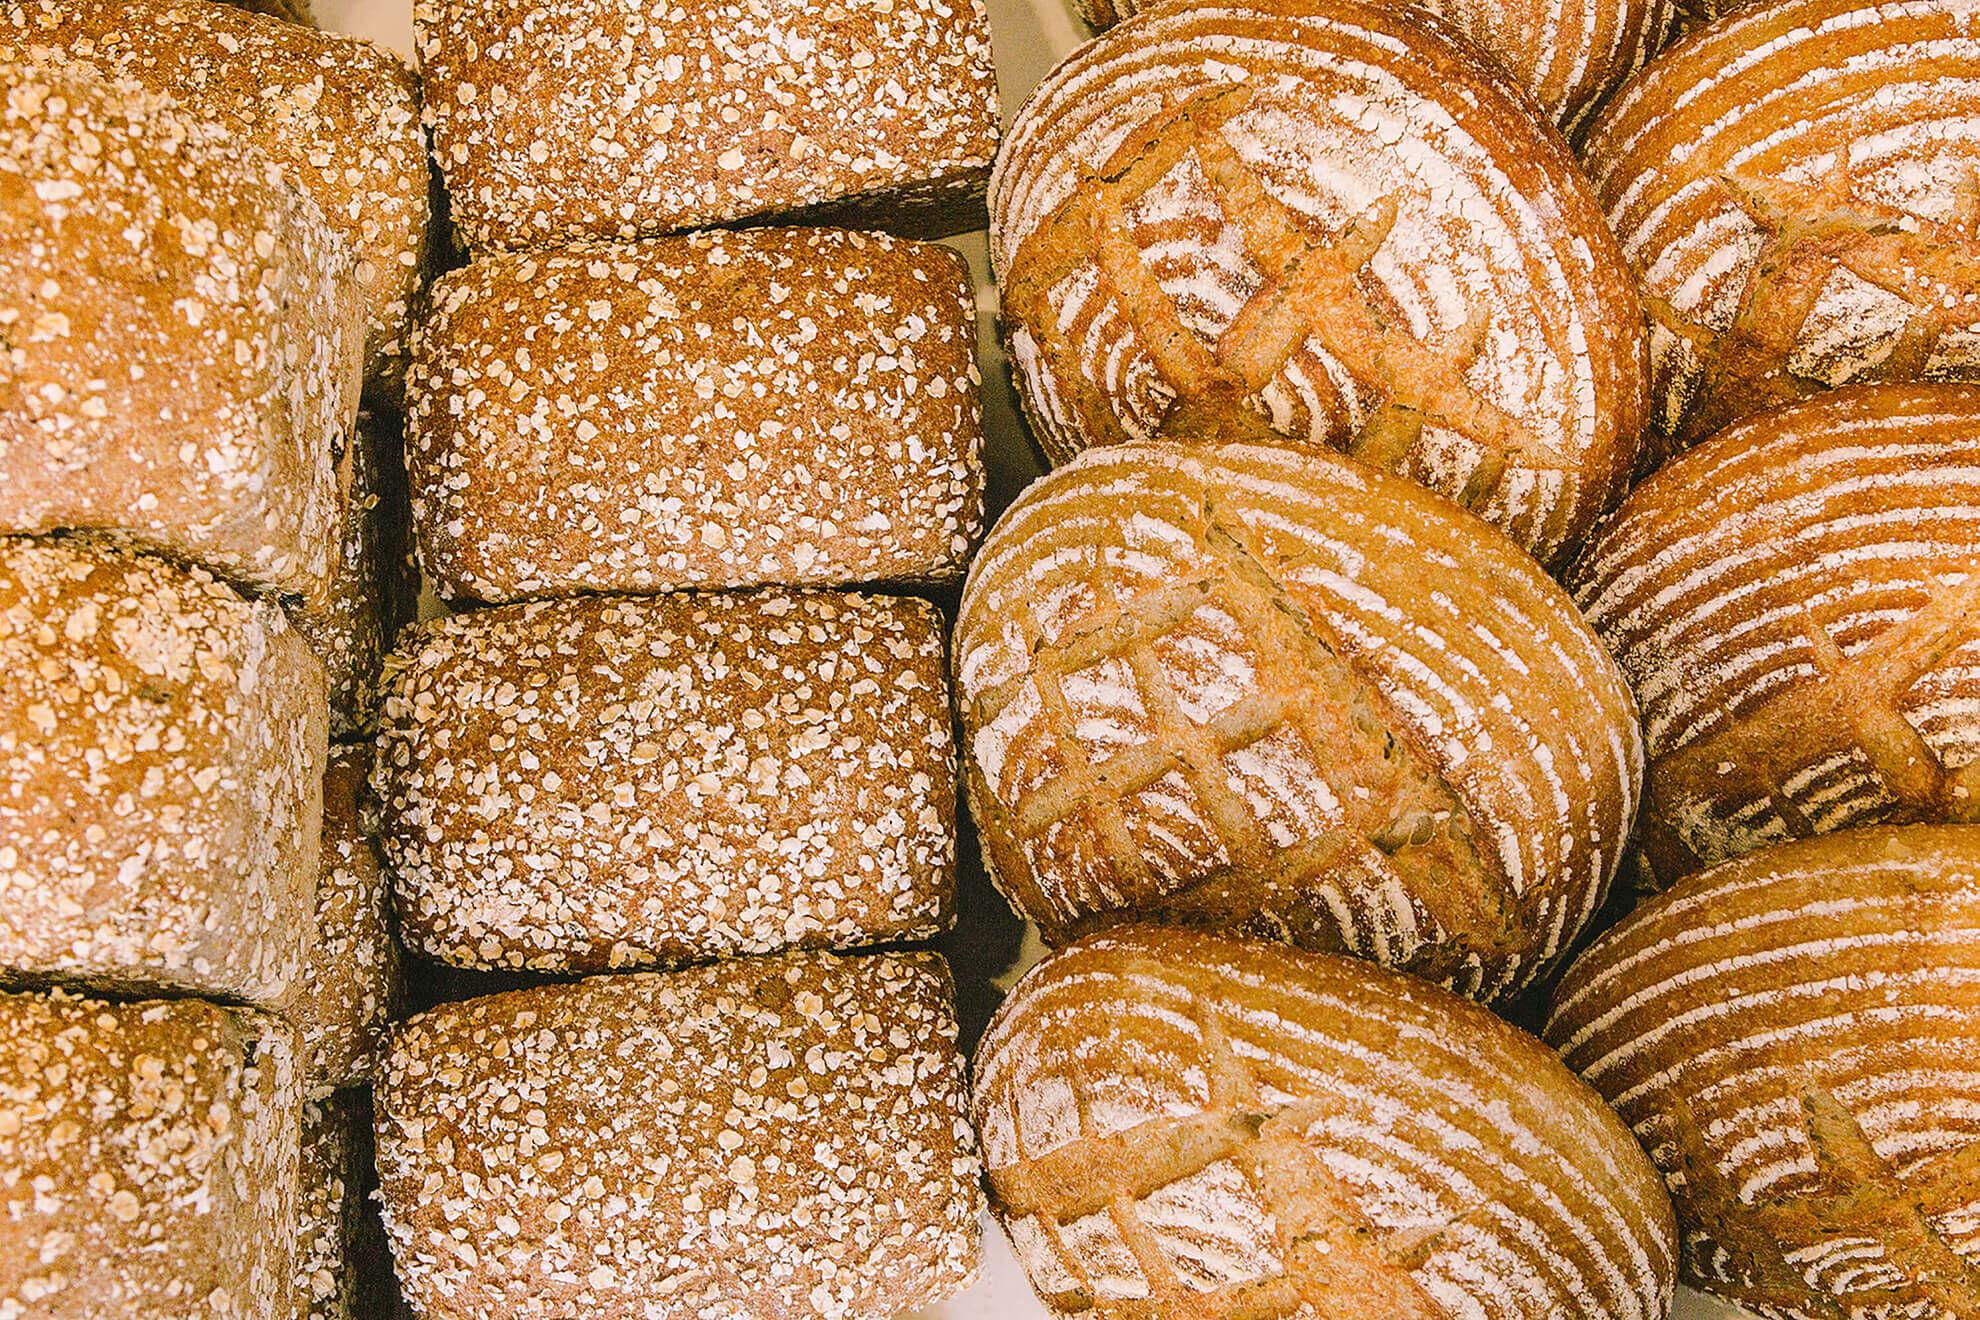 Organic, Bread, England, British, Daylesford, Food, Baking, Photography, Agency, Gloucestershire, WeAreShuffle